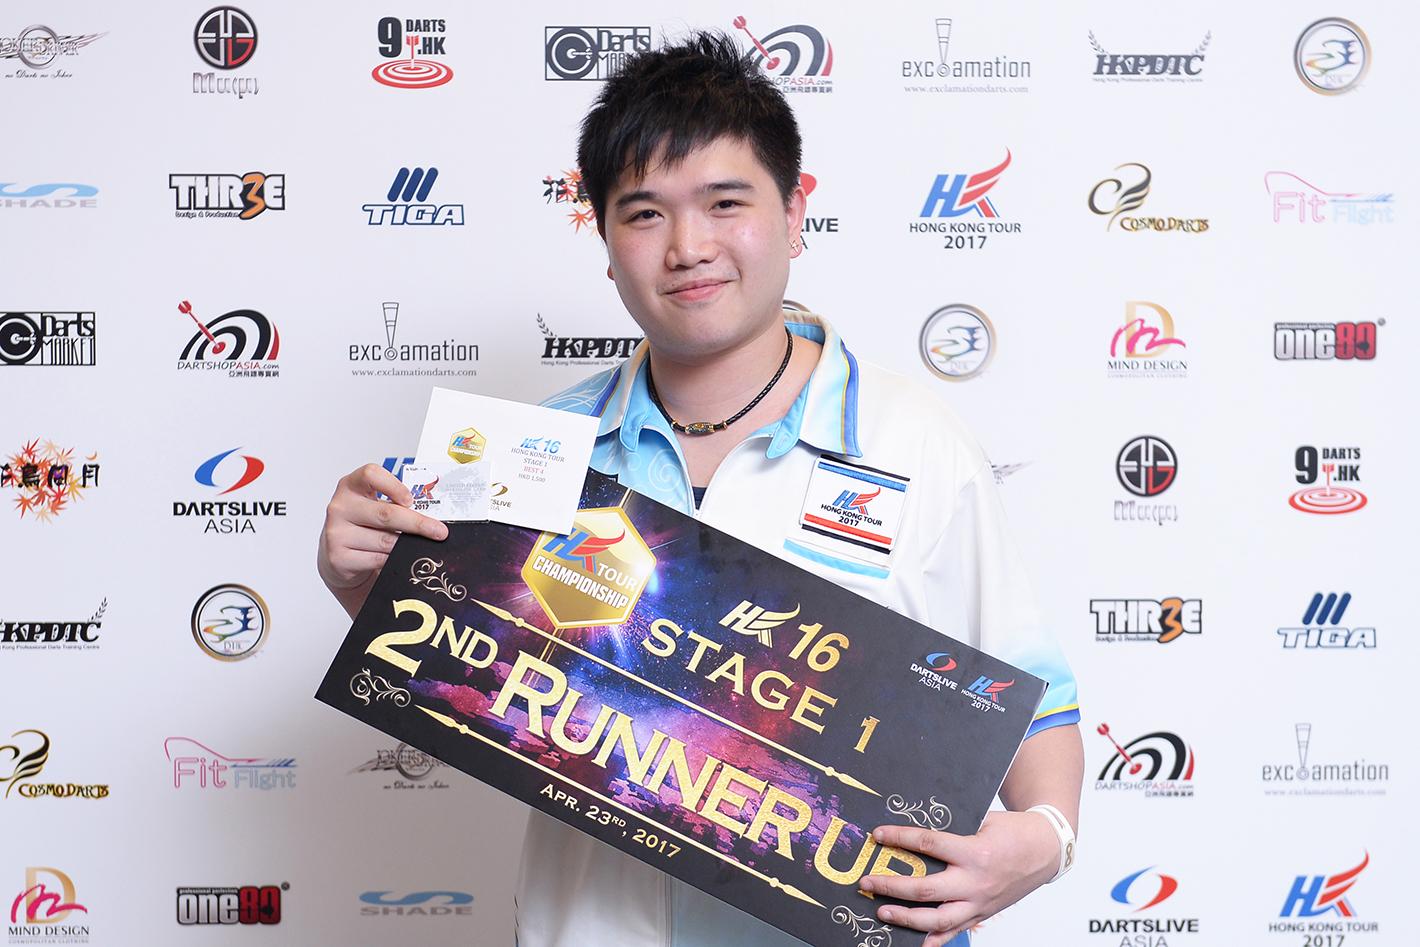 HKTCS_2017_HK16_Stage1_Result_PRINCE_SHEK